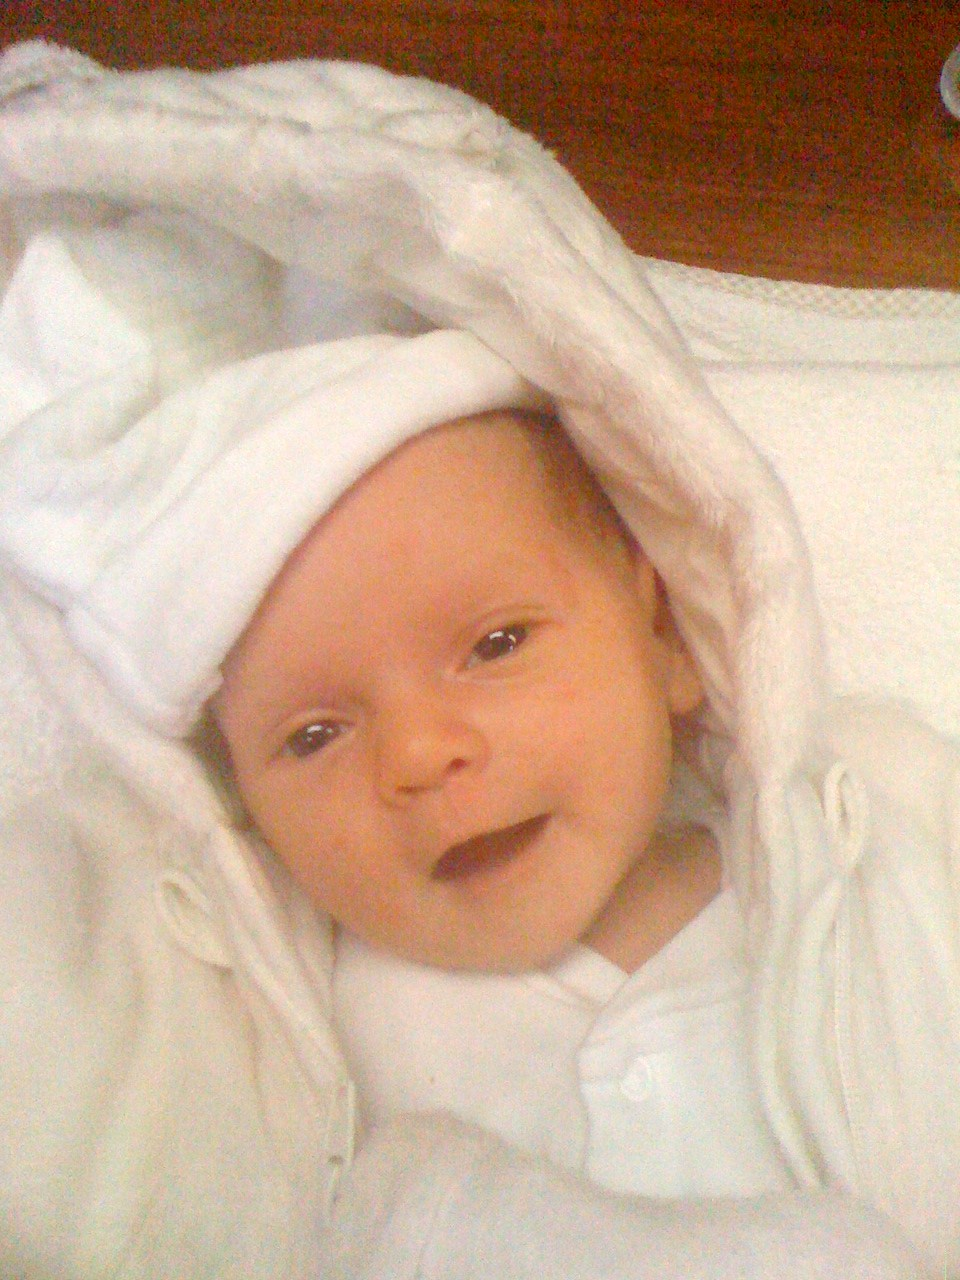 Childbirth Hypnosis, Hypnotherapy for Childbirth